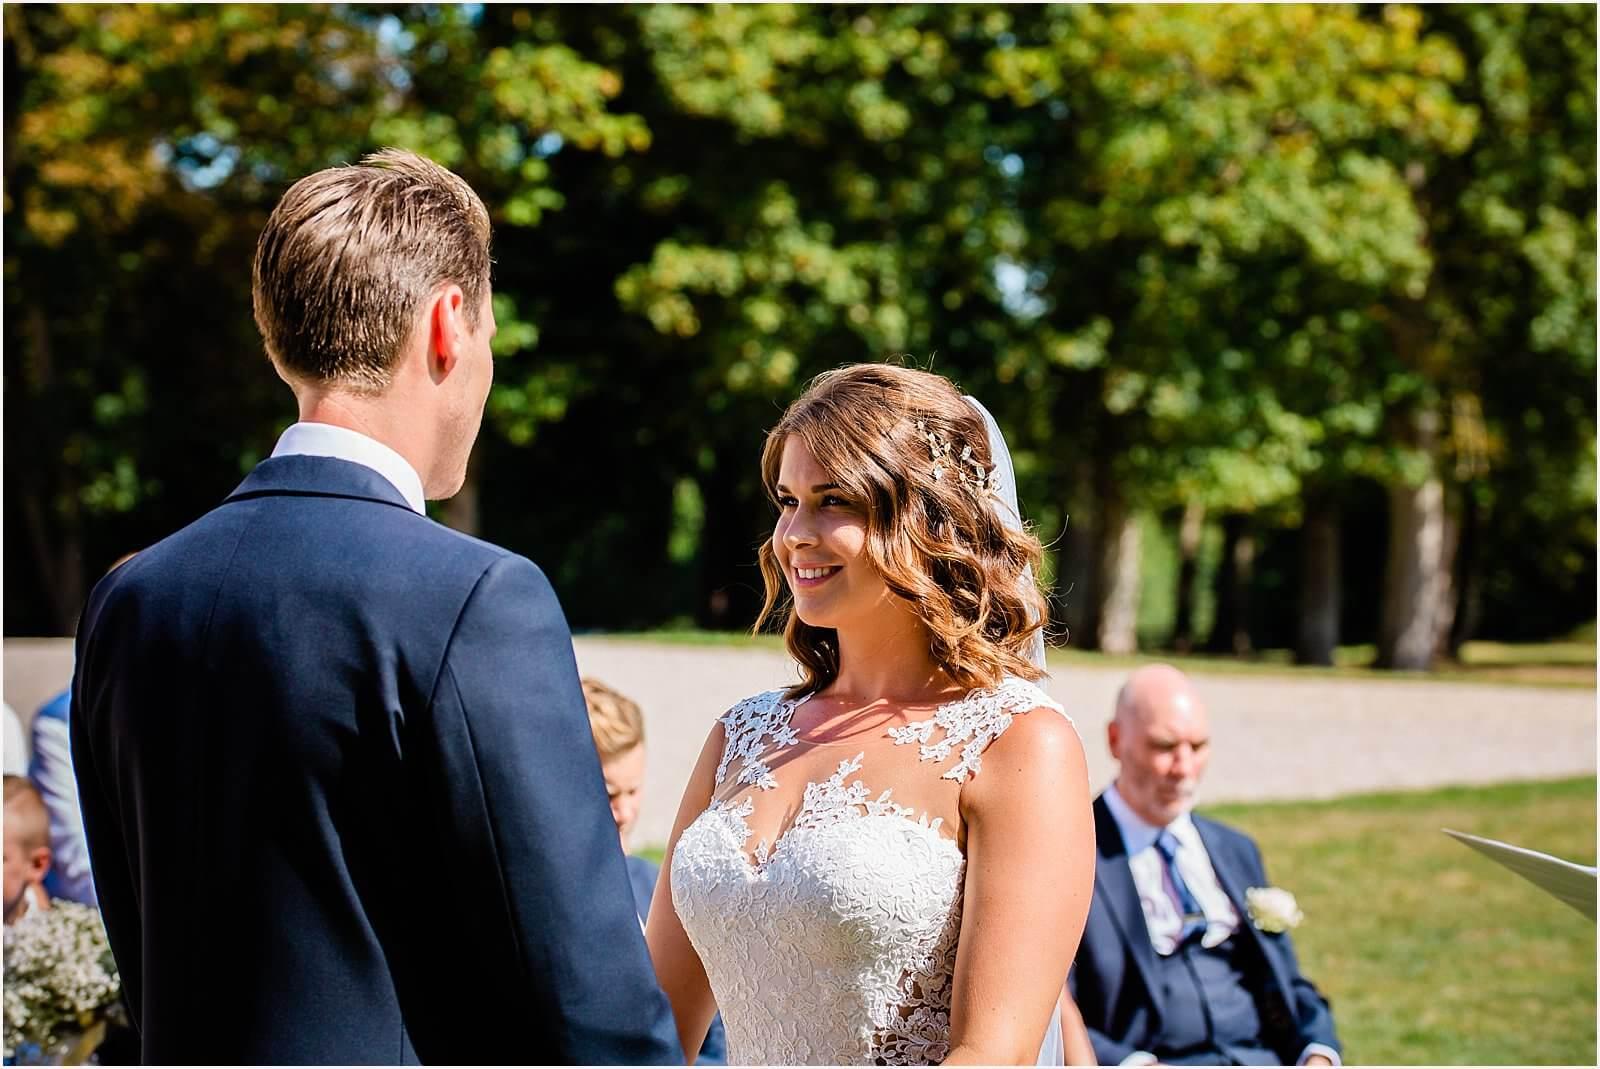 Chateau de Courtomer Wedding | Chantel & Evan 28